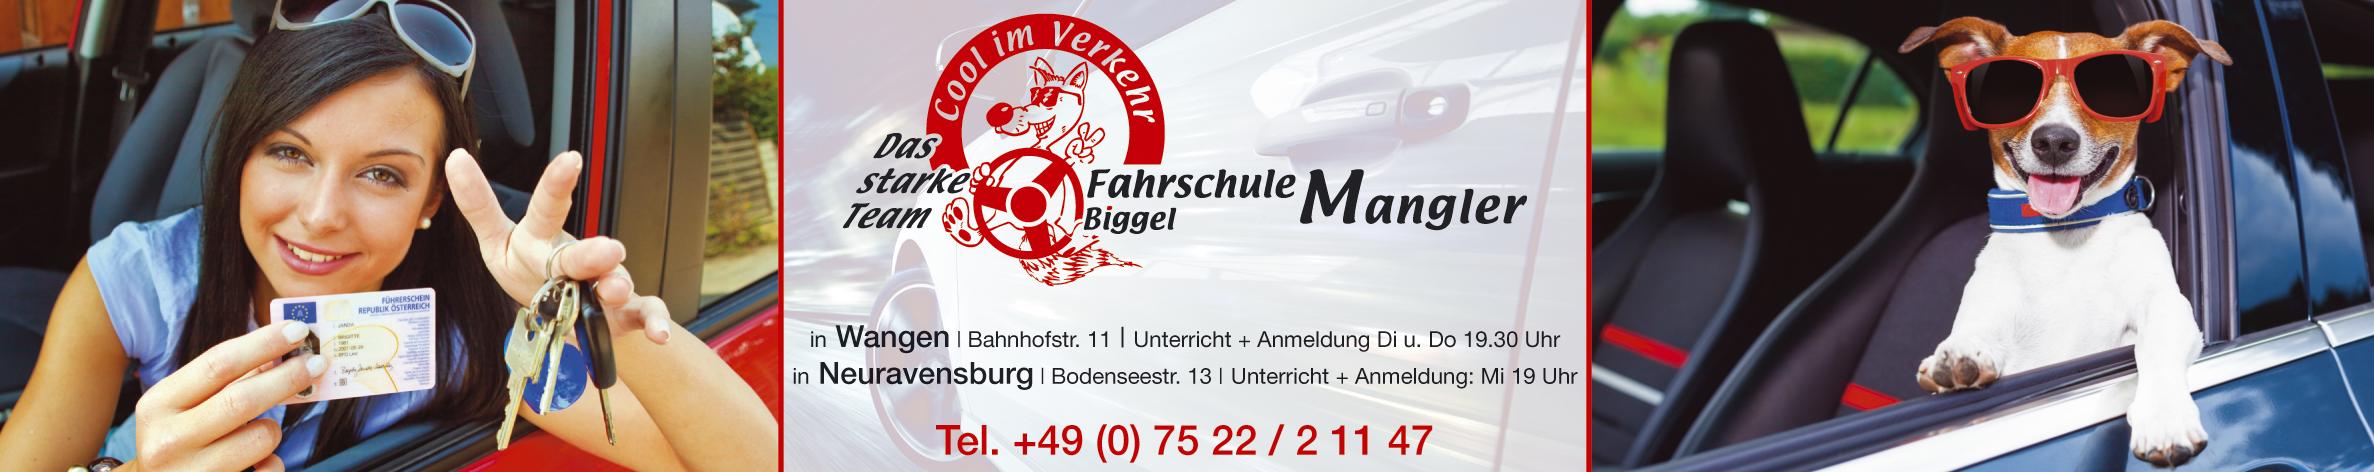 Fahrschule Biggel MANGLER